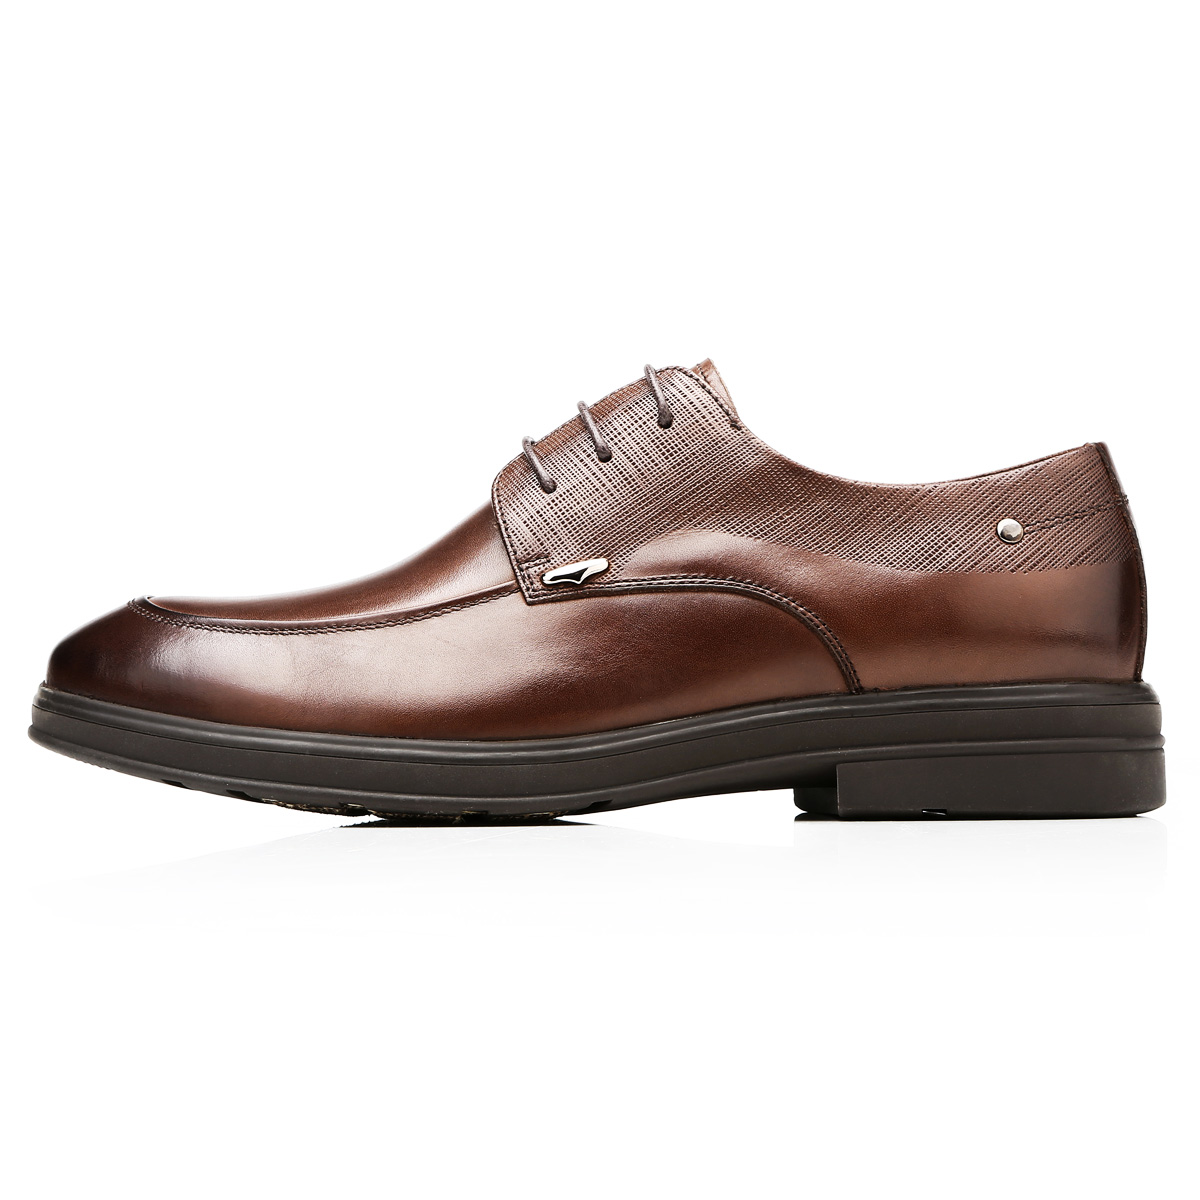 Giày da nam Olunpo QHSL1405 thời trang